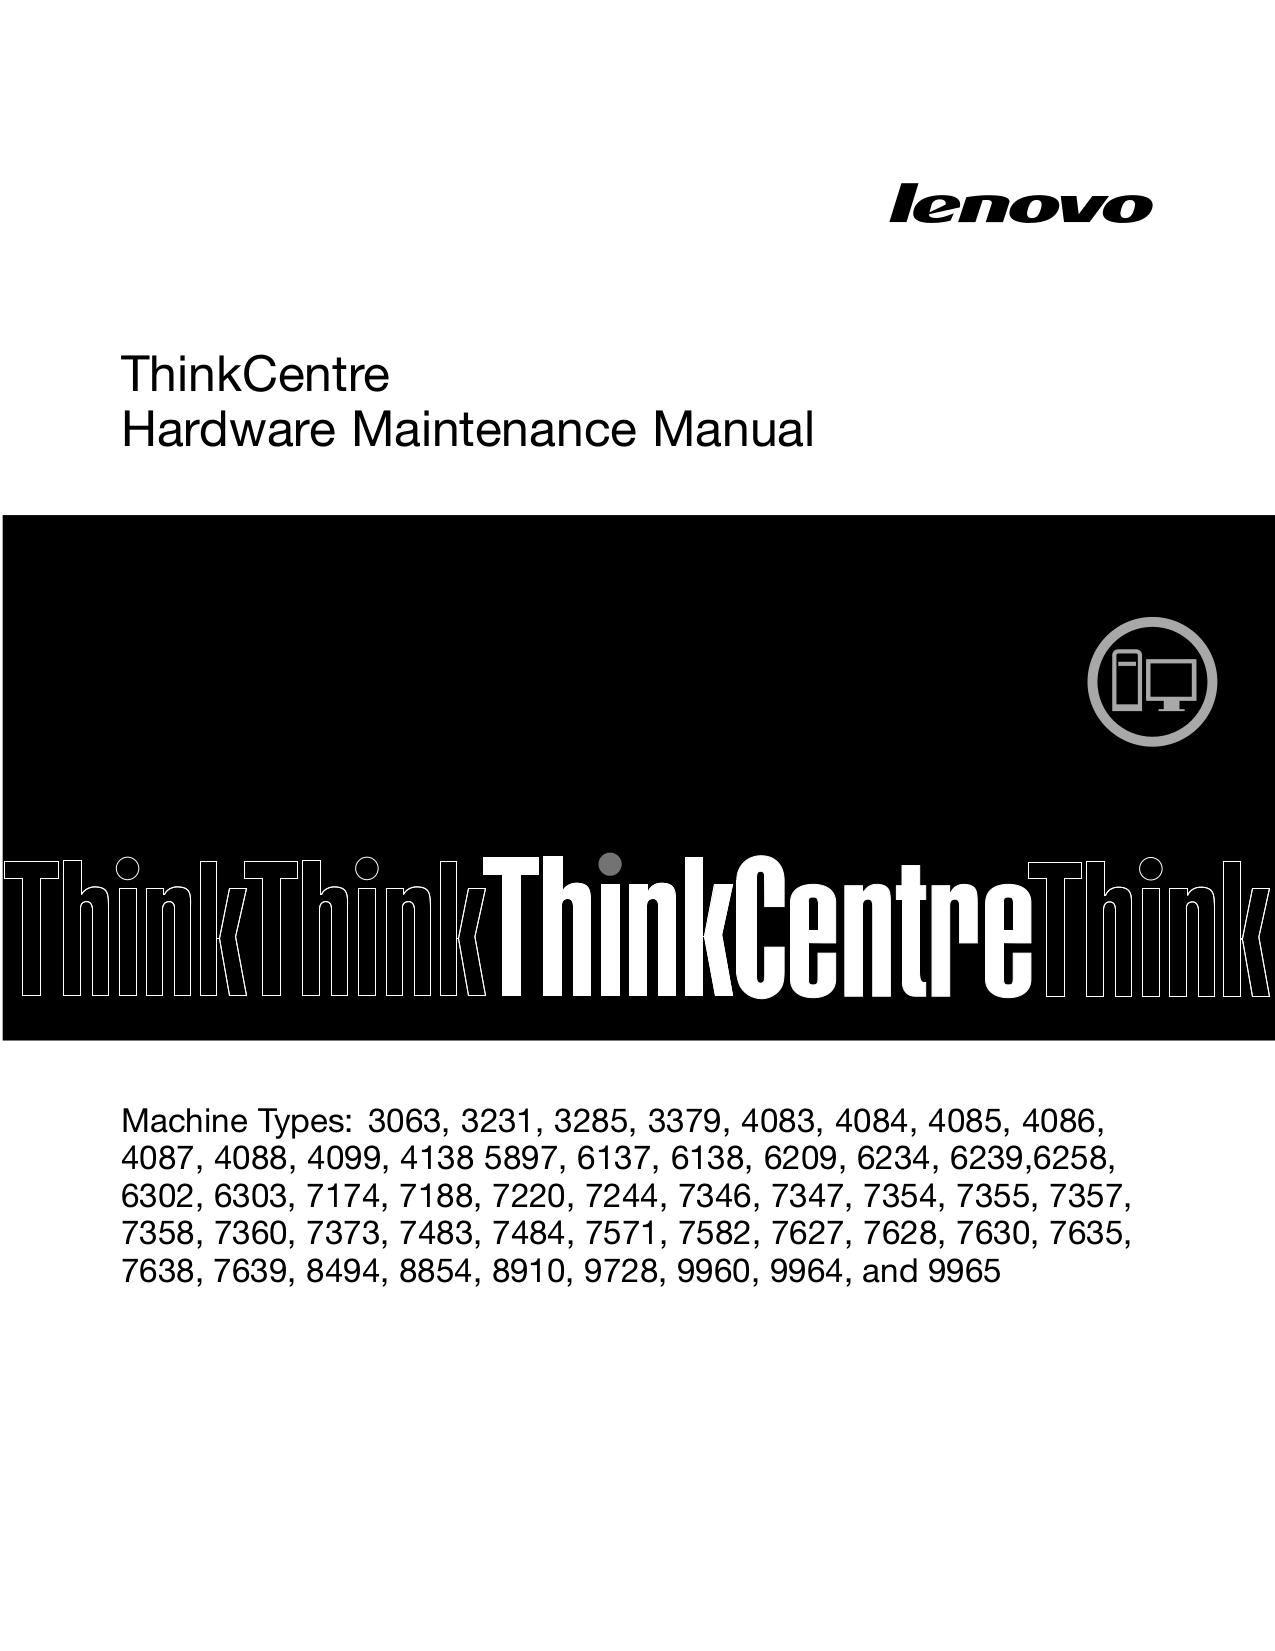 pdf for Lenovo Desktop ThinkCentre M58 6303 manual